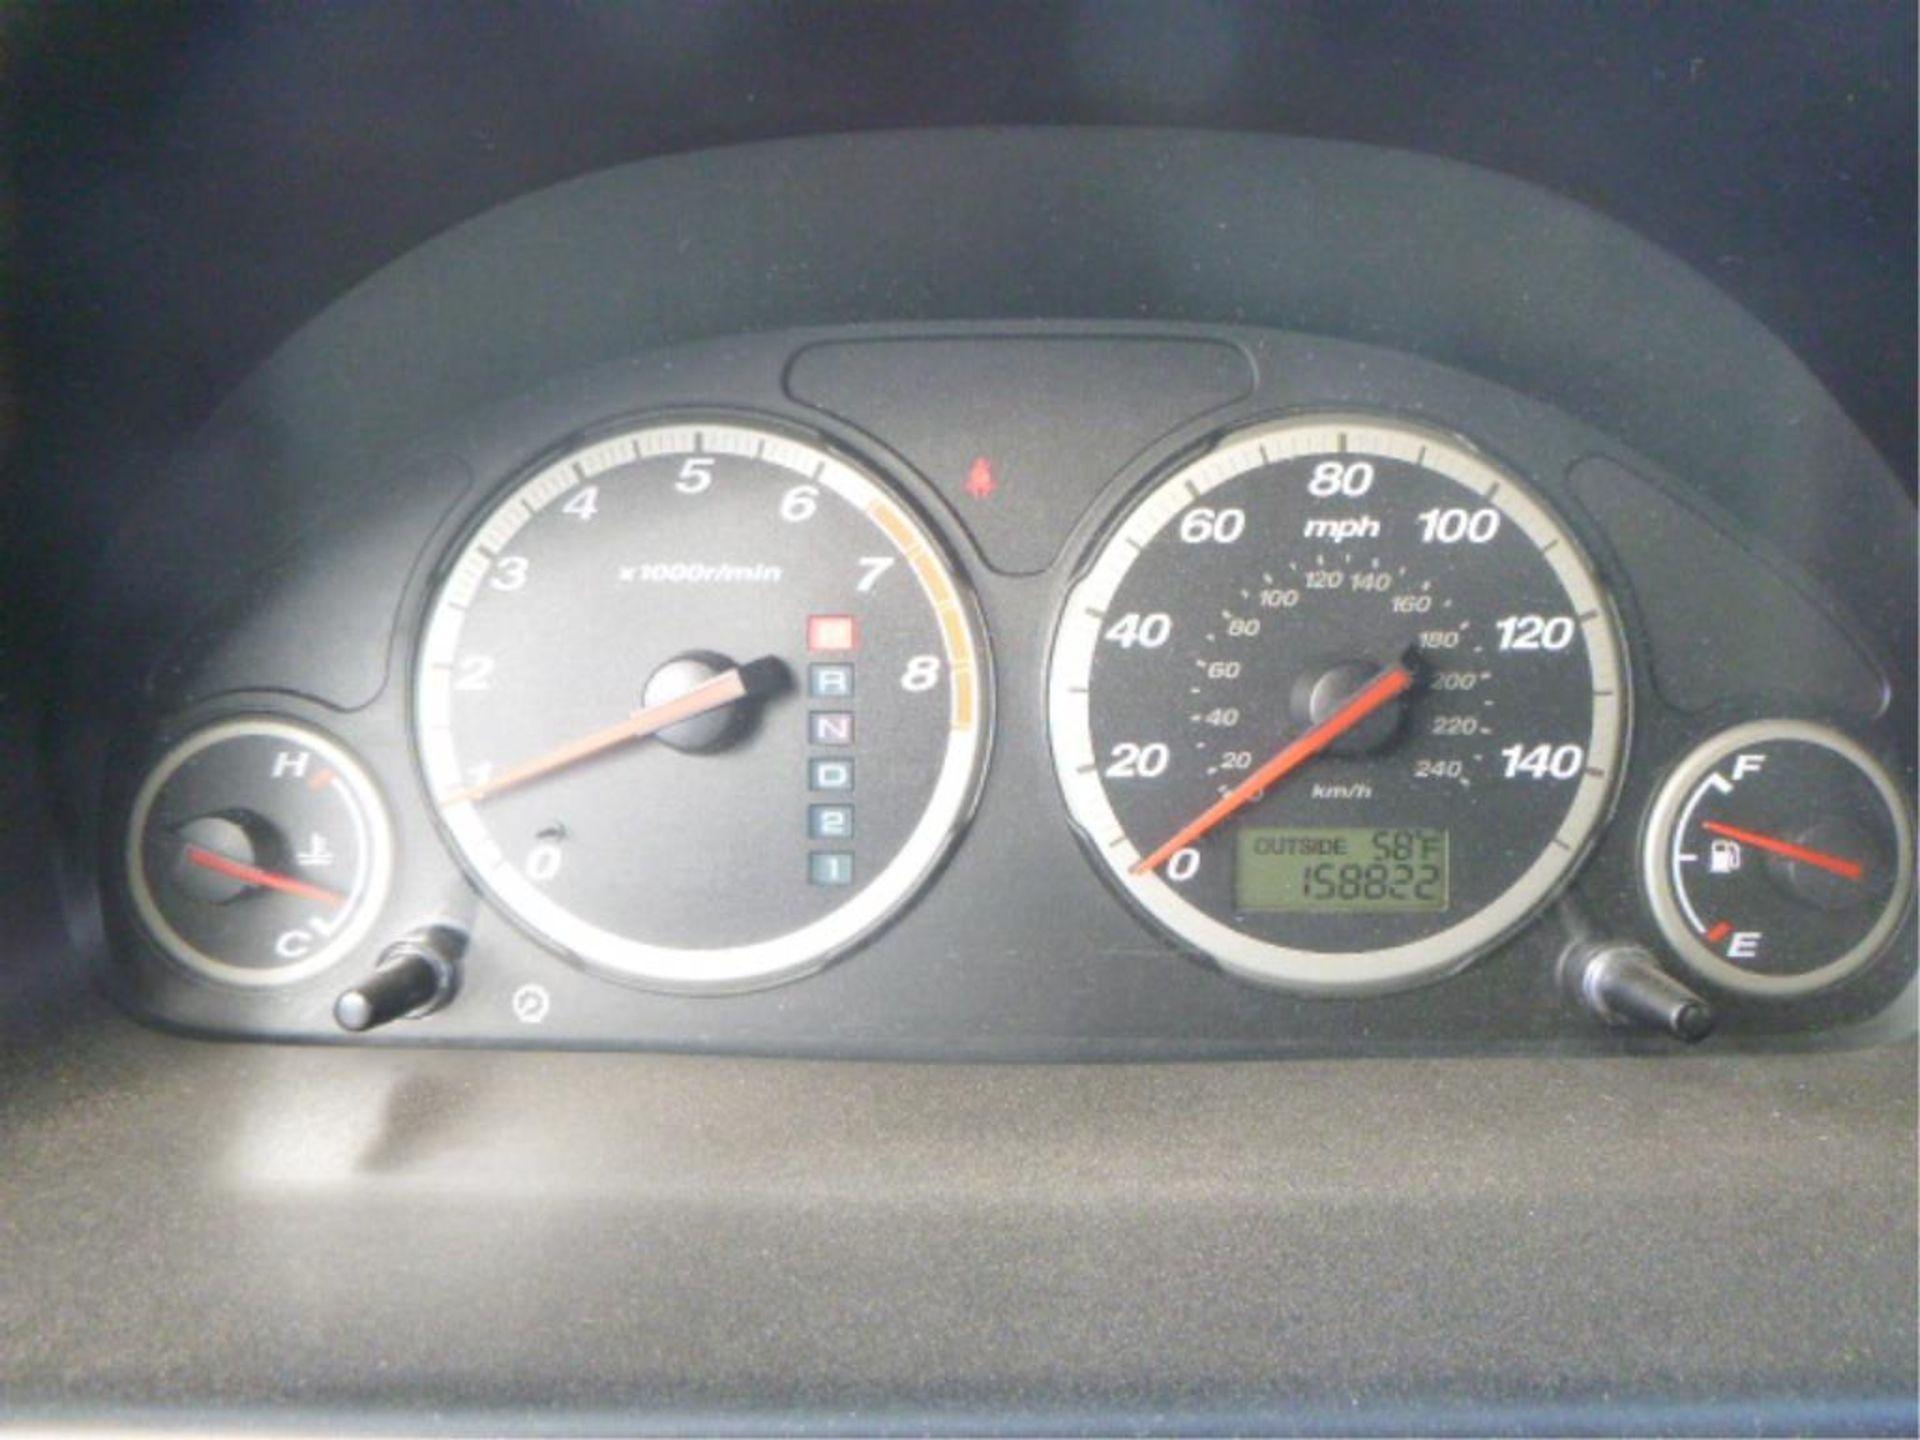 2005 Honda CR-V - Image 12 of 14